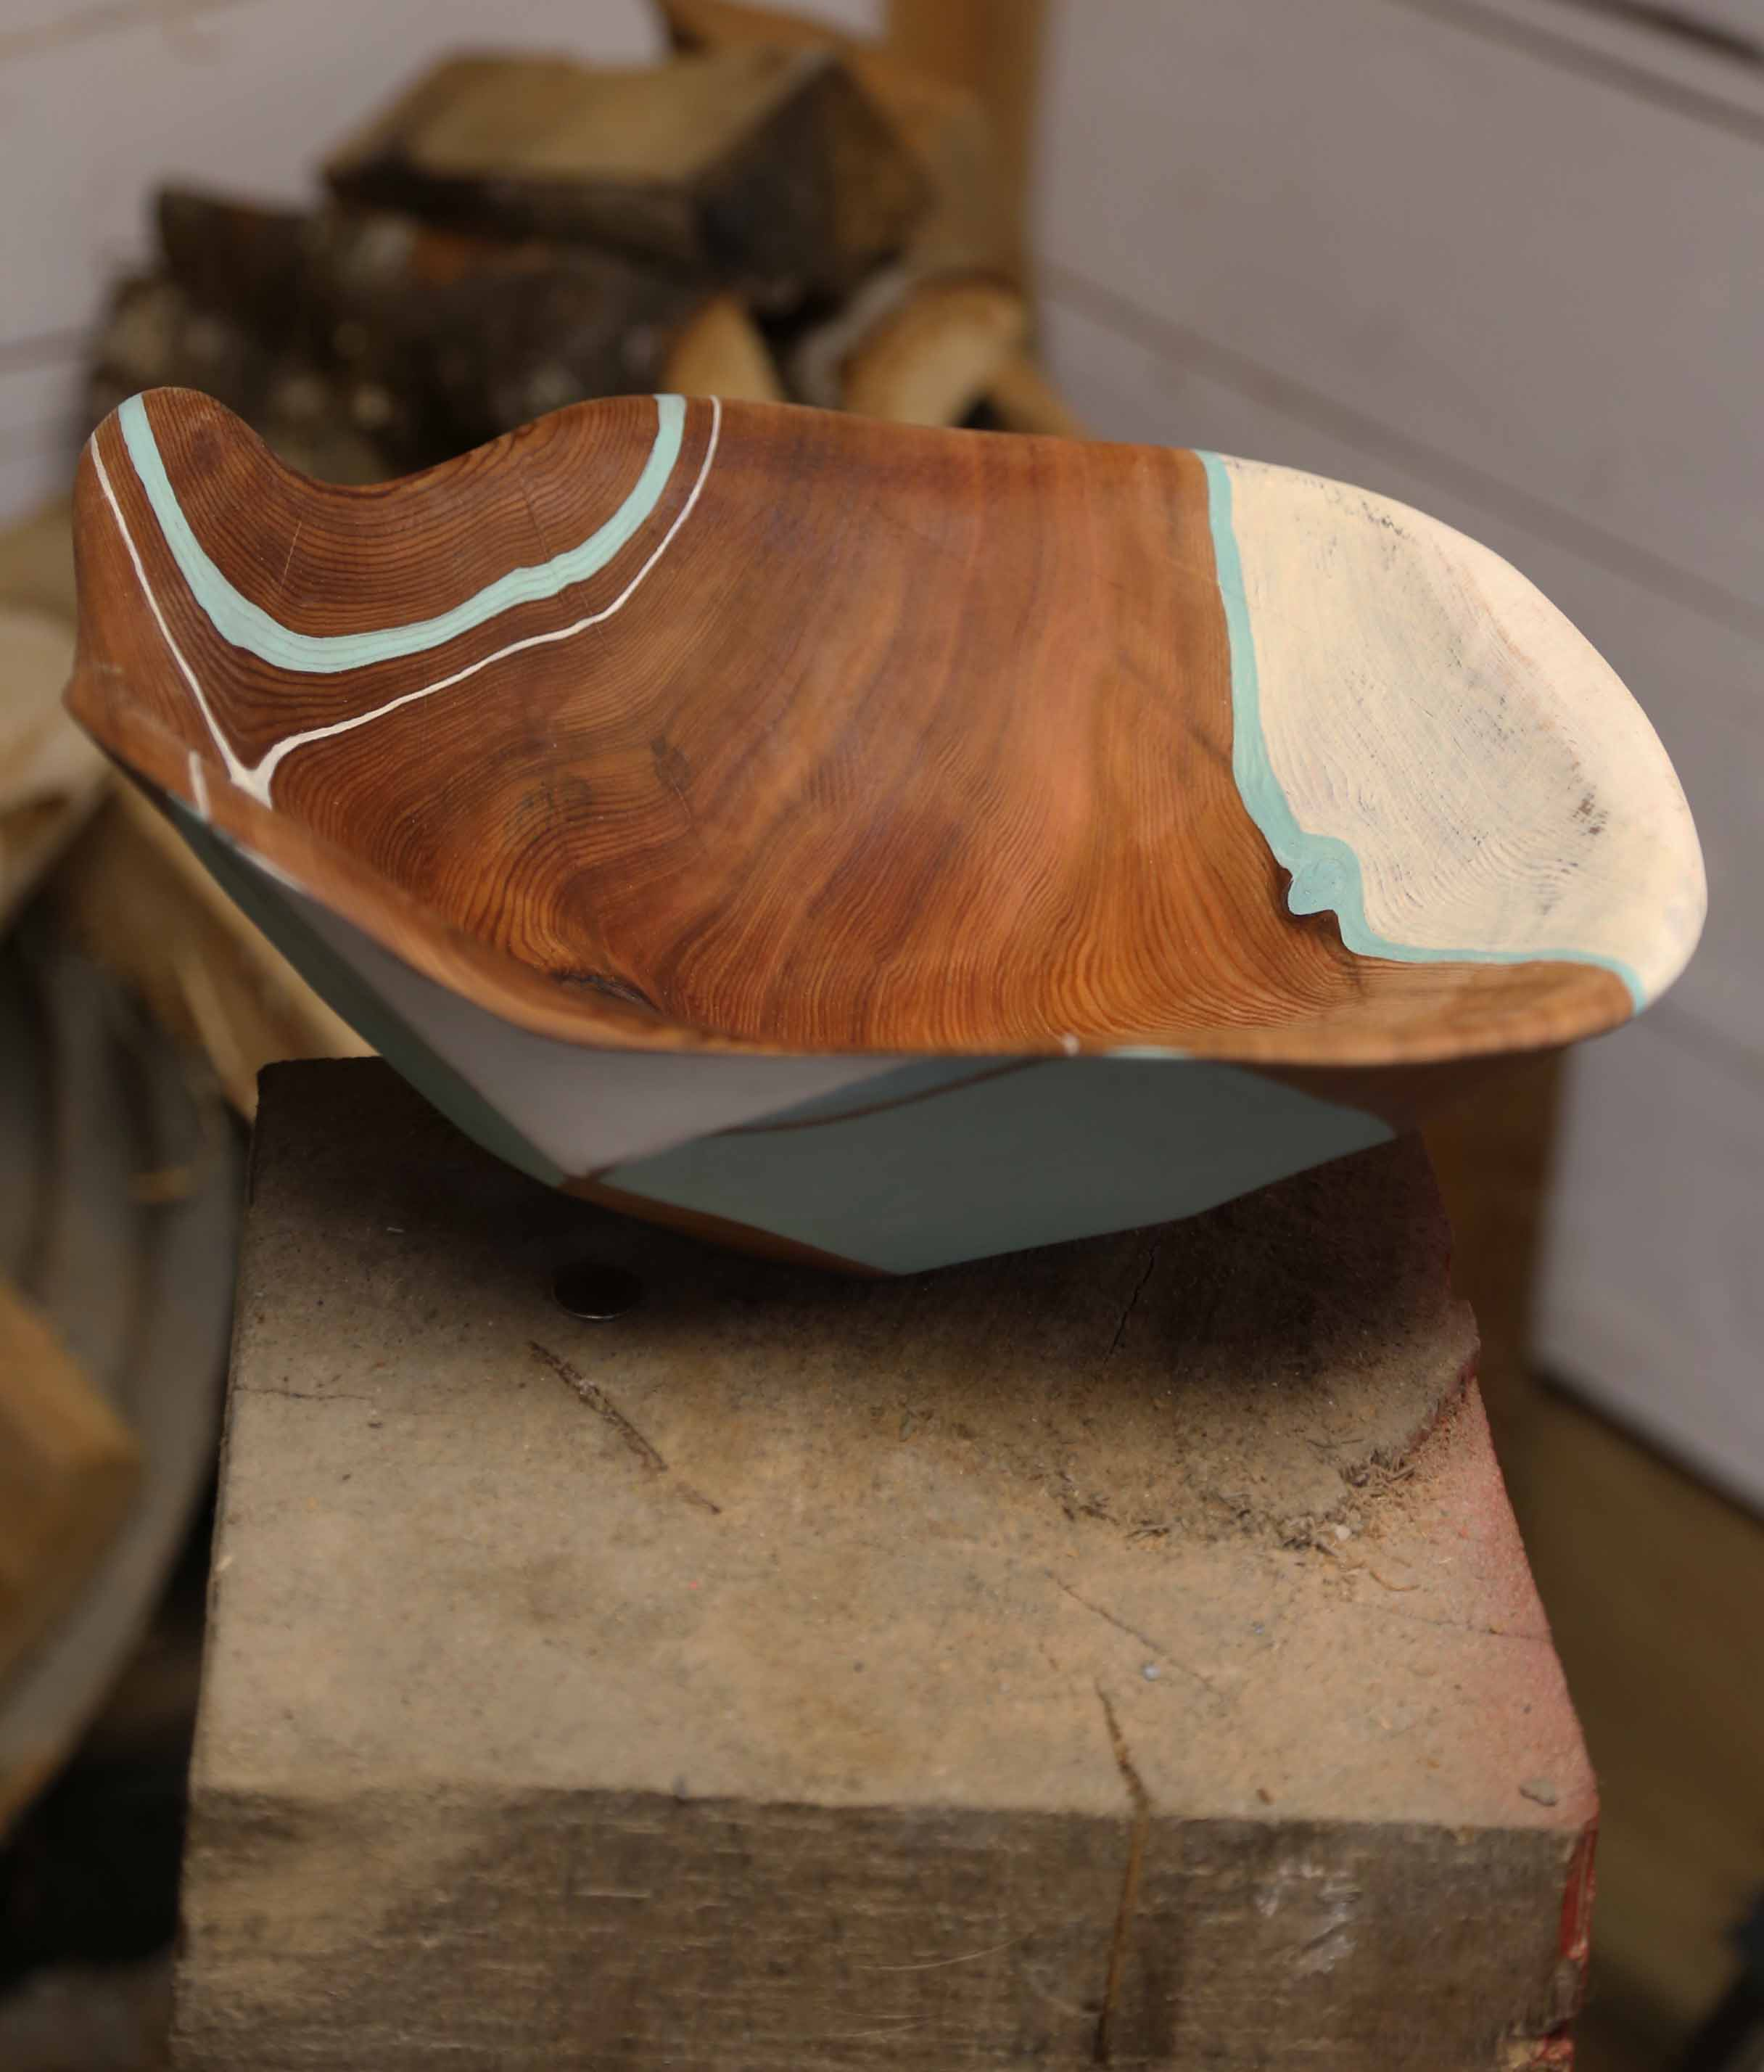 "Geograin 5 - 12x11x7"" - western red cedar, milk paint, walnut oil, beeswax - roderick brown - 2017"